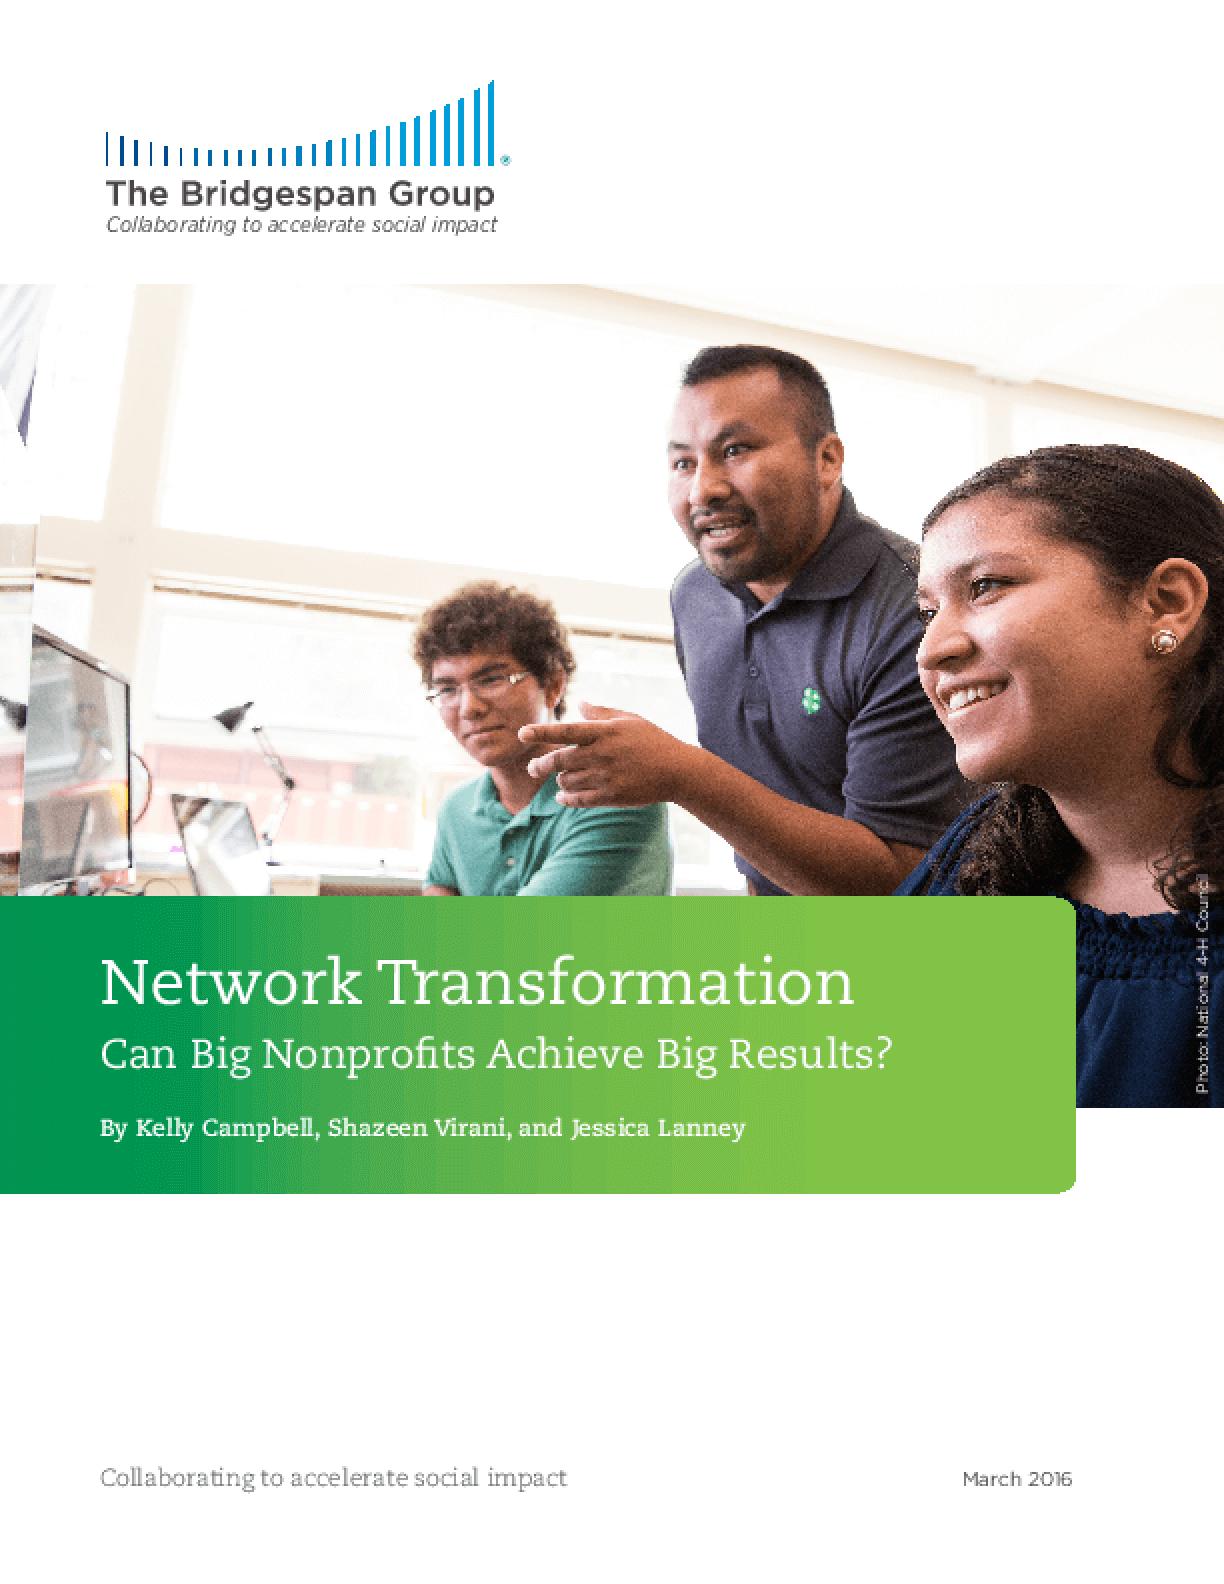 Network Transformation: Can Big Nonprofits Achieve Big Results?